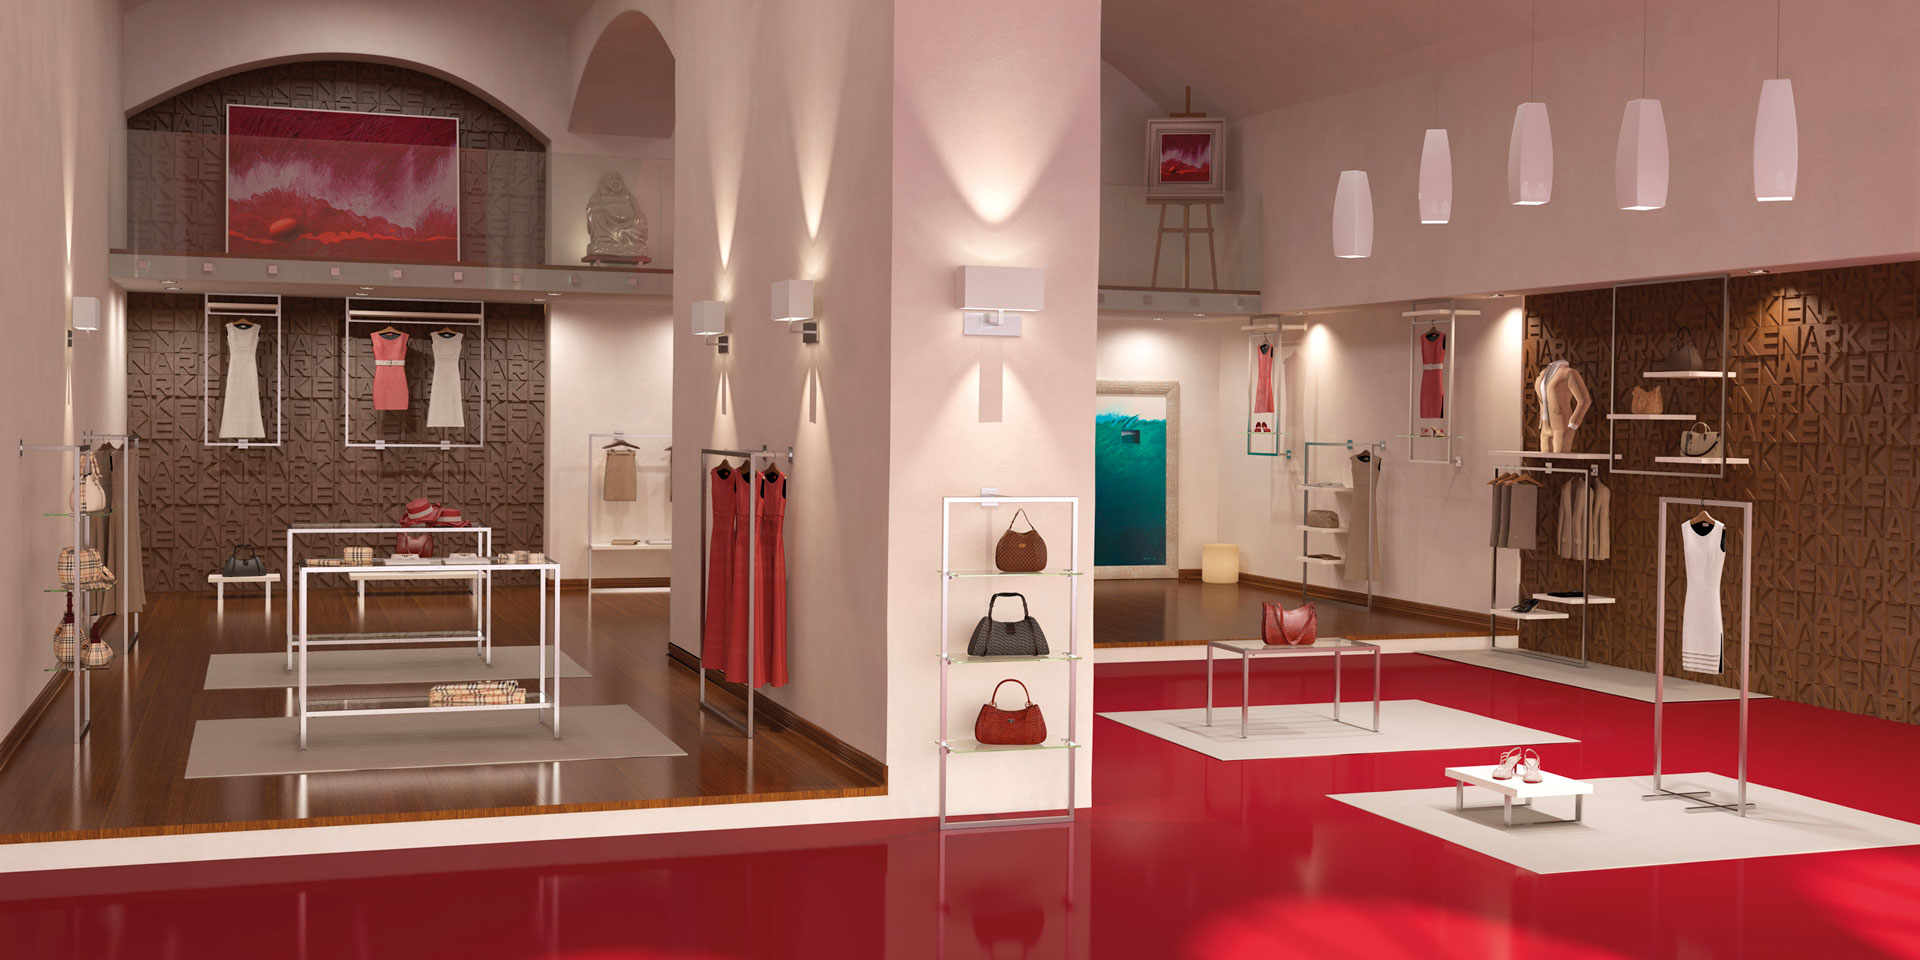 Arredamento etnico firenze design casa creativa e mobili ispiratori - Mobili cinesi milano ...